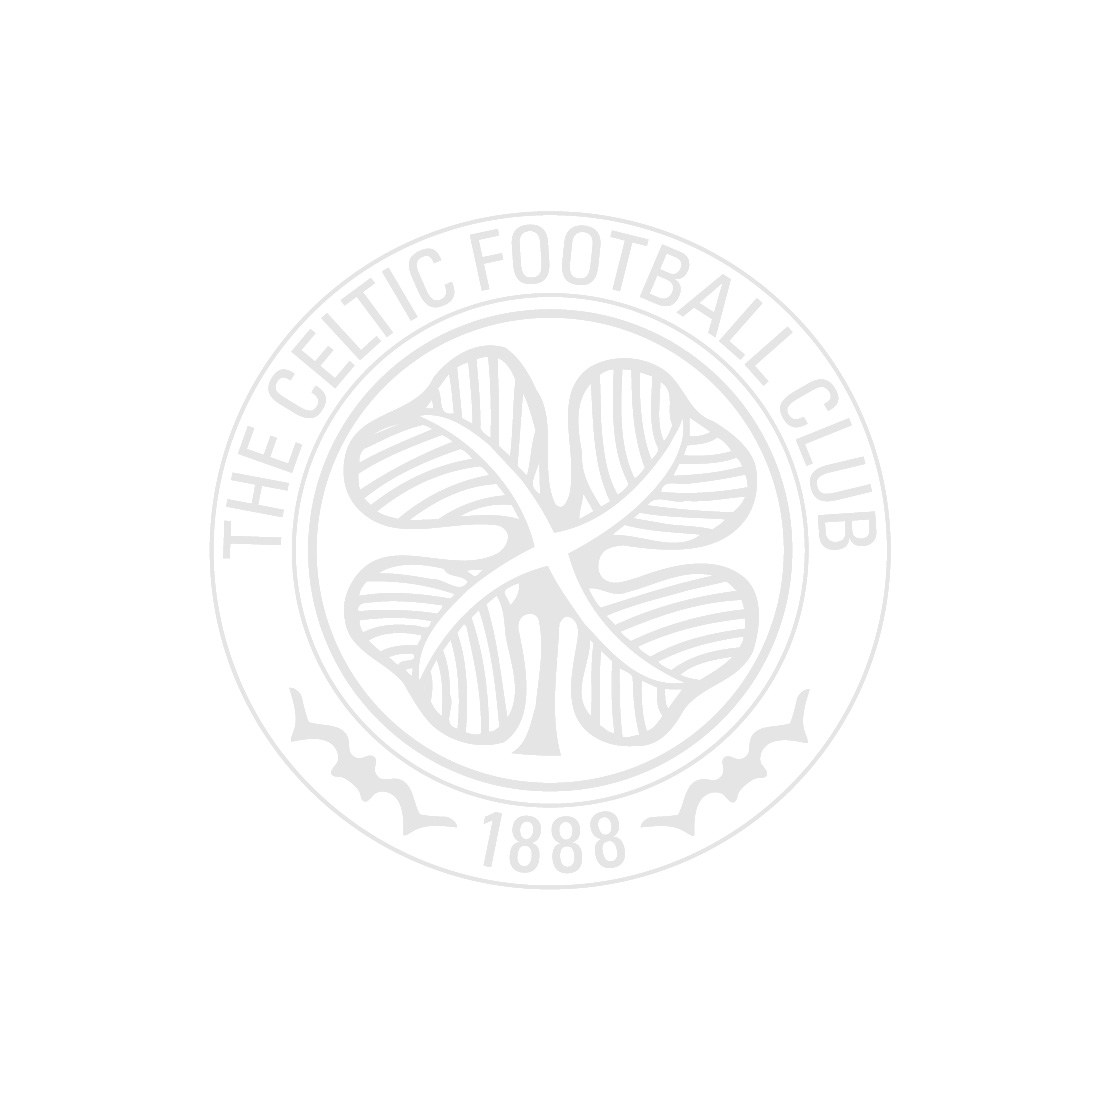 Celtic 2018 Tartan Tie